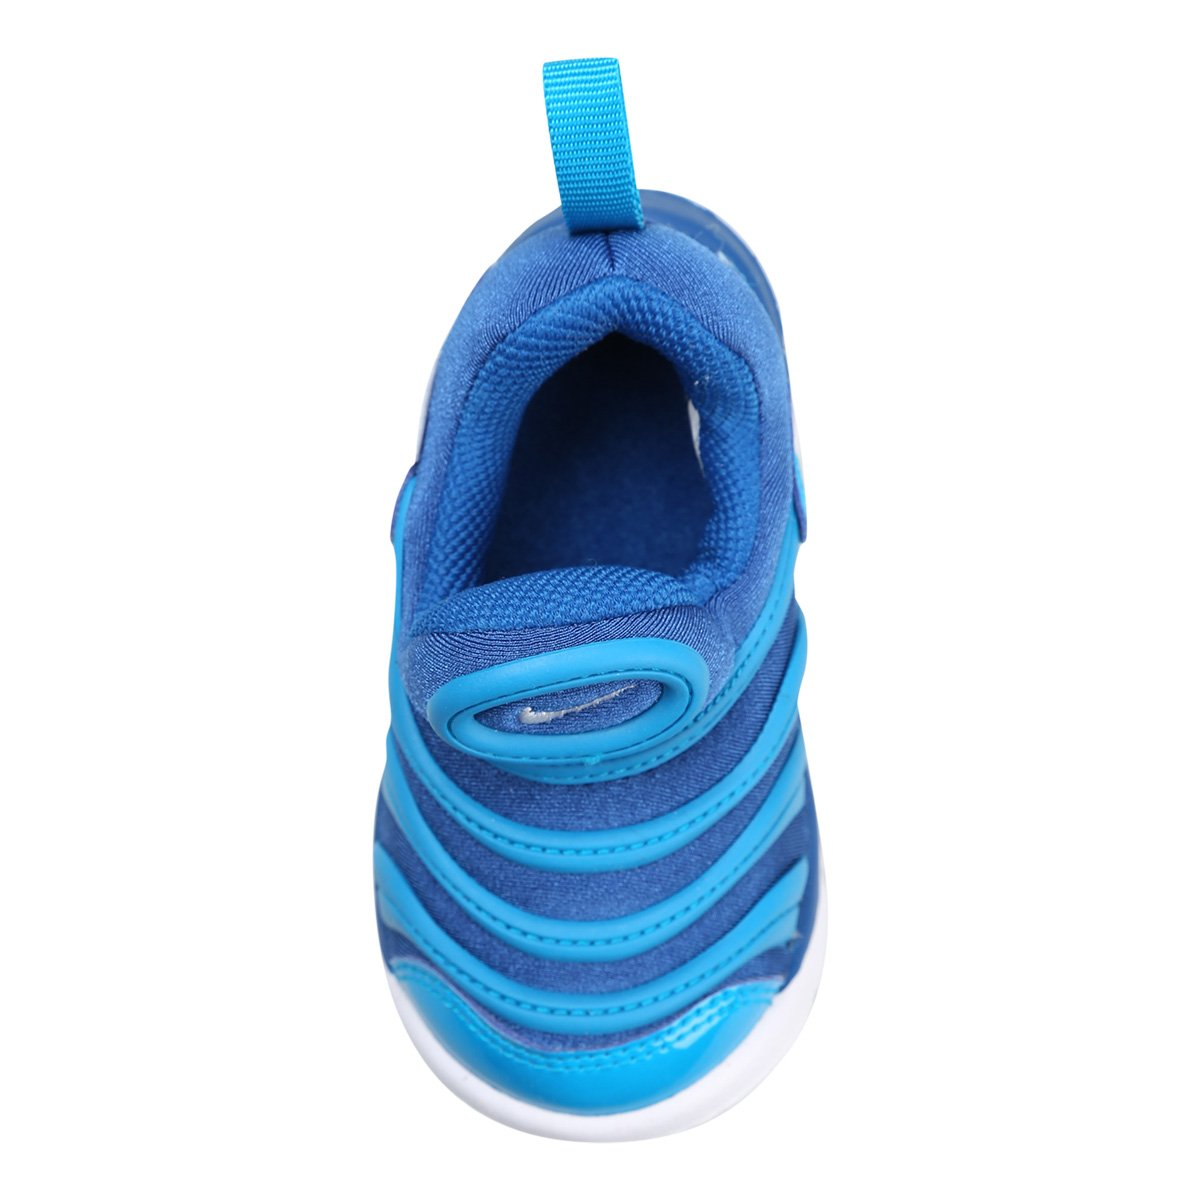 low priced a9b67 8b9fd ... Tênis Infantil Nike Dynamo Free TD Masculino